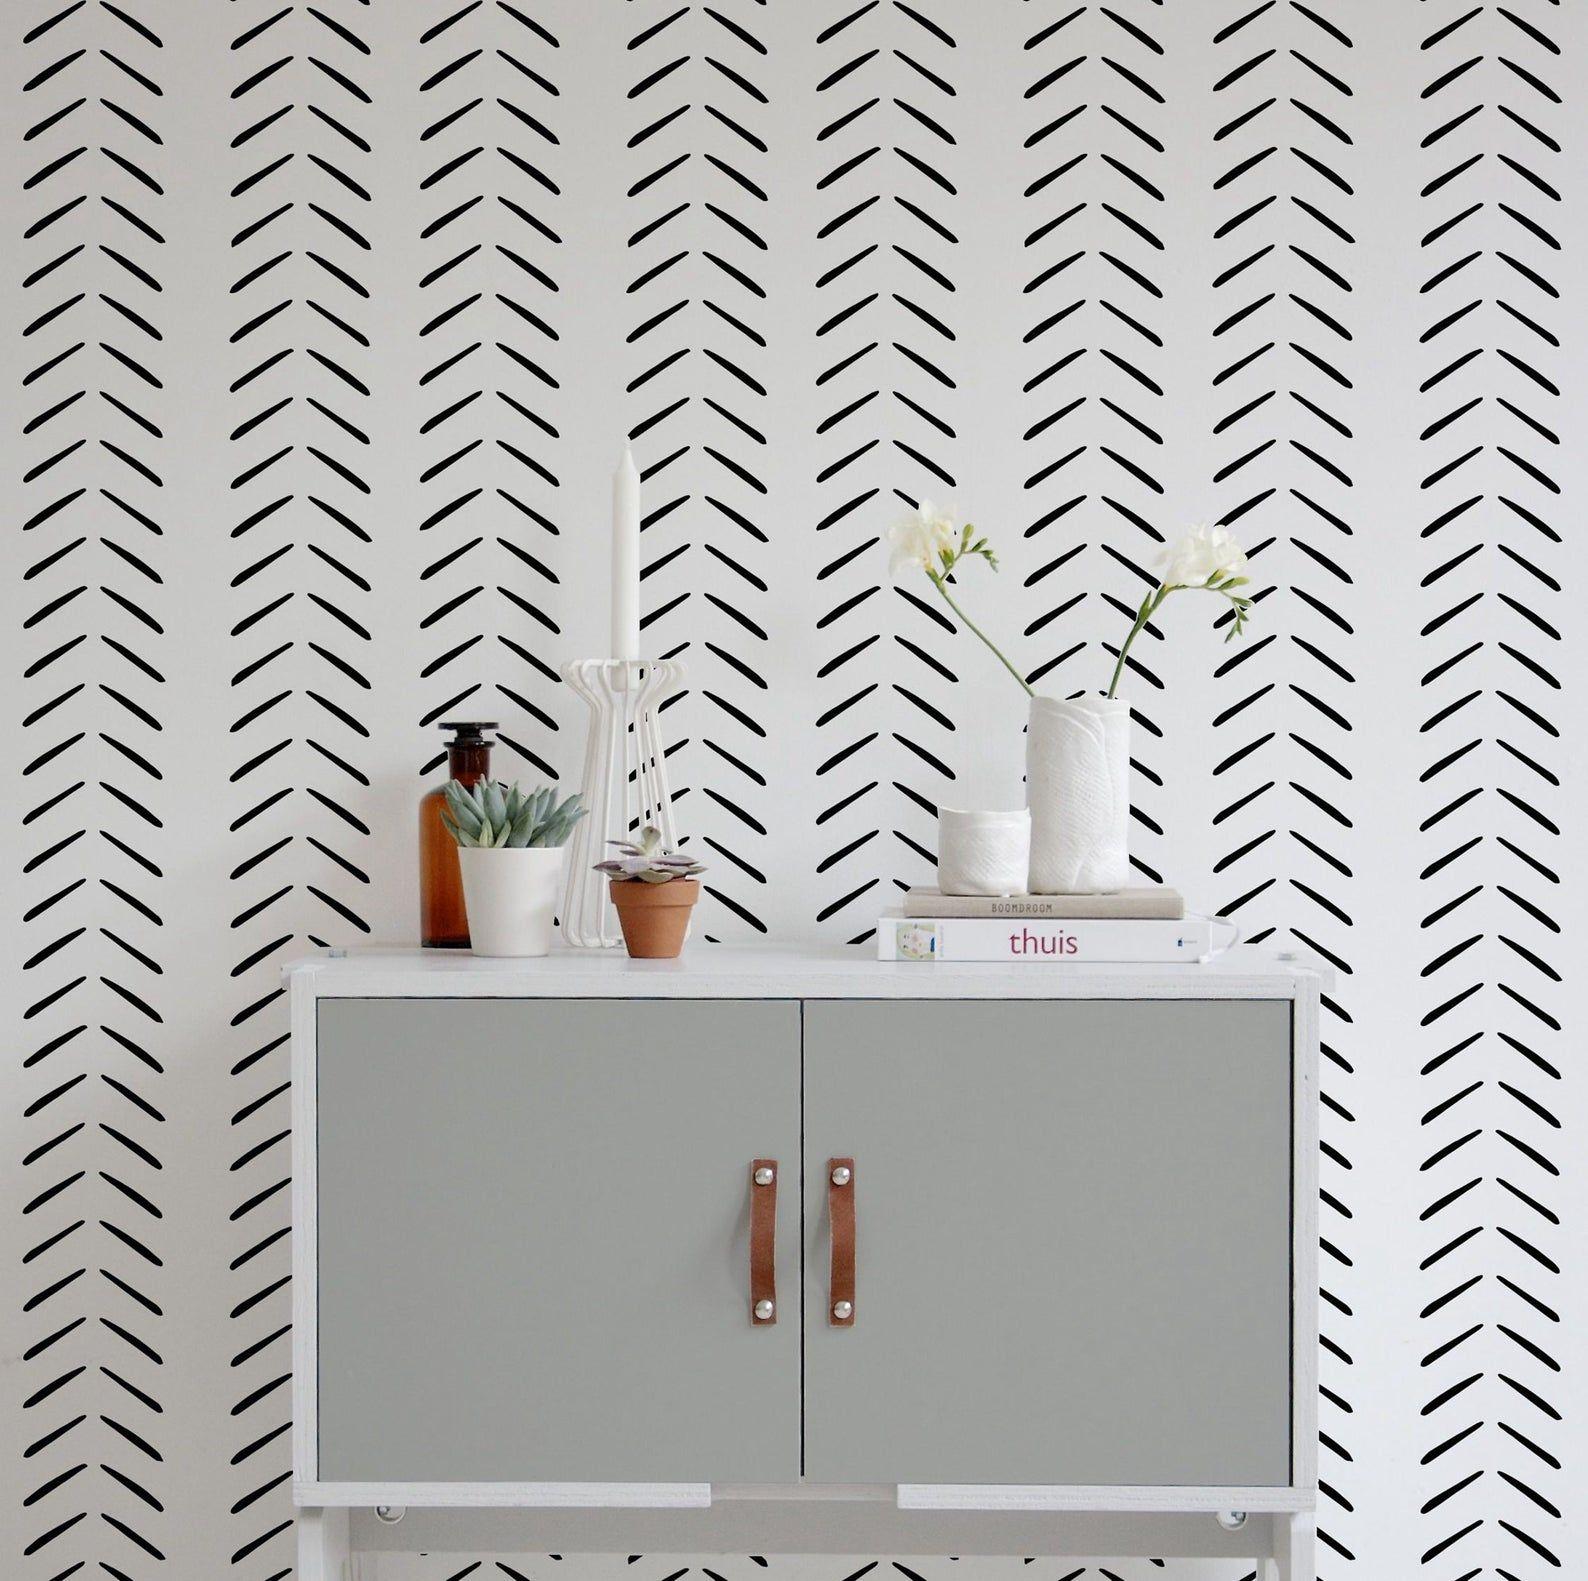 Modern Delicate Giant Herringbone Wallpaper In Black And Etsy In 2021 Herringbone Wallpaper Striped Walls Horizontal Peel And Stick Wallpaper